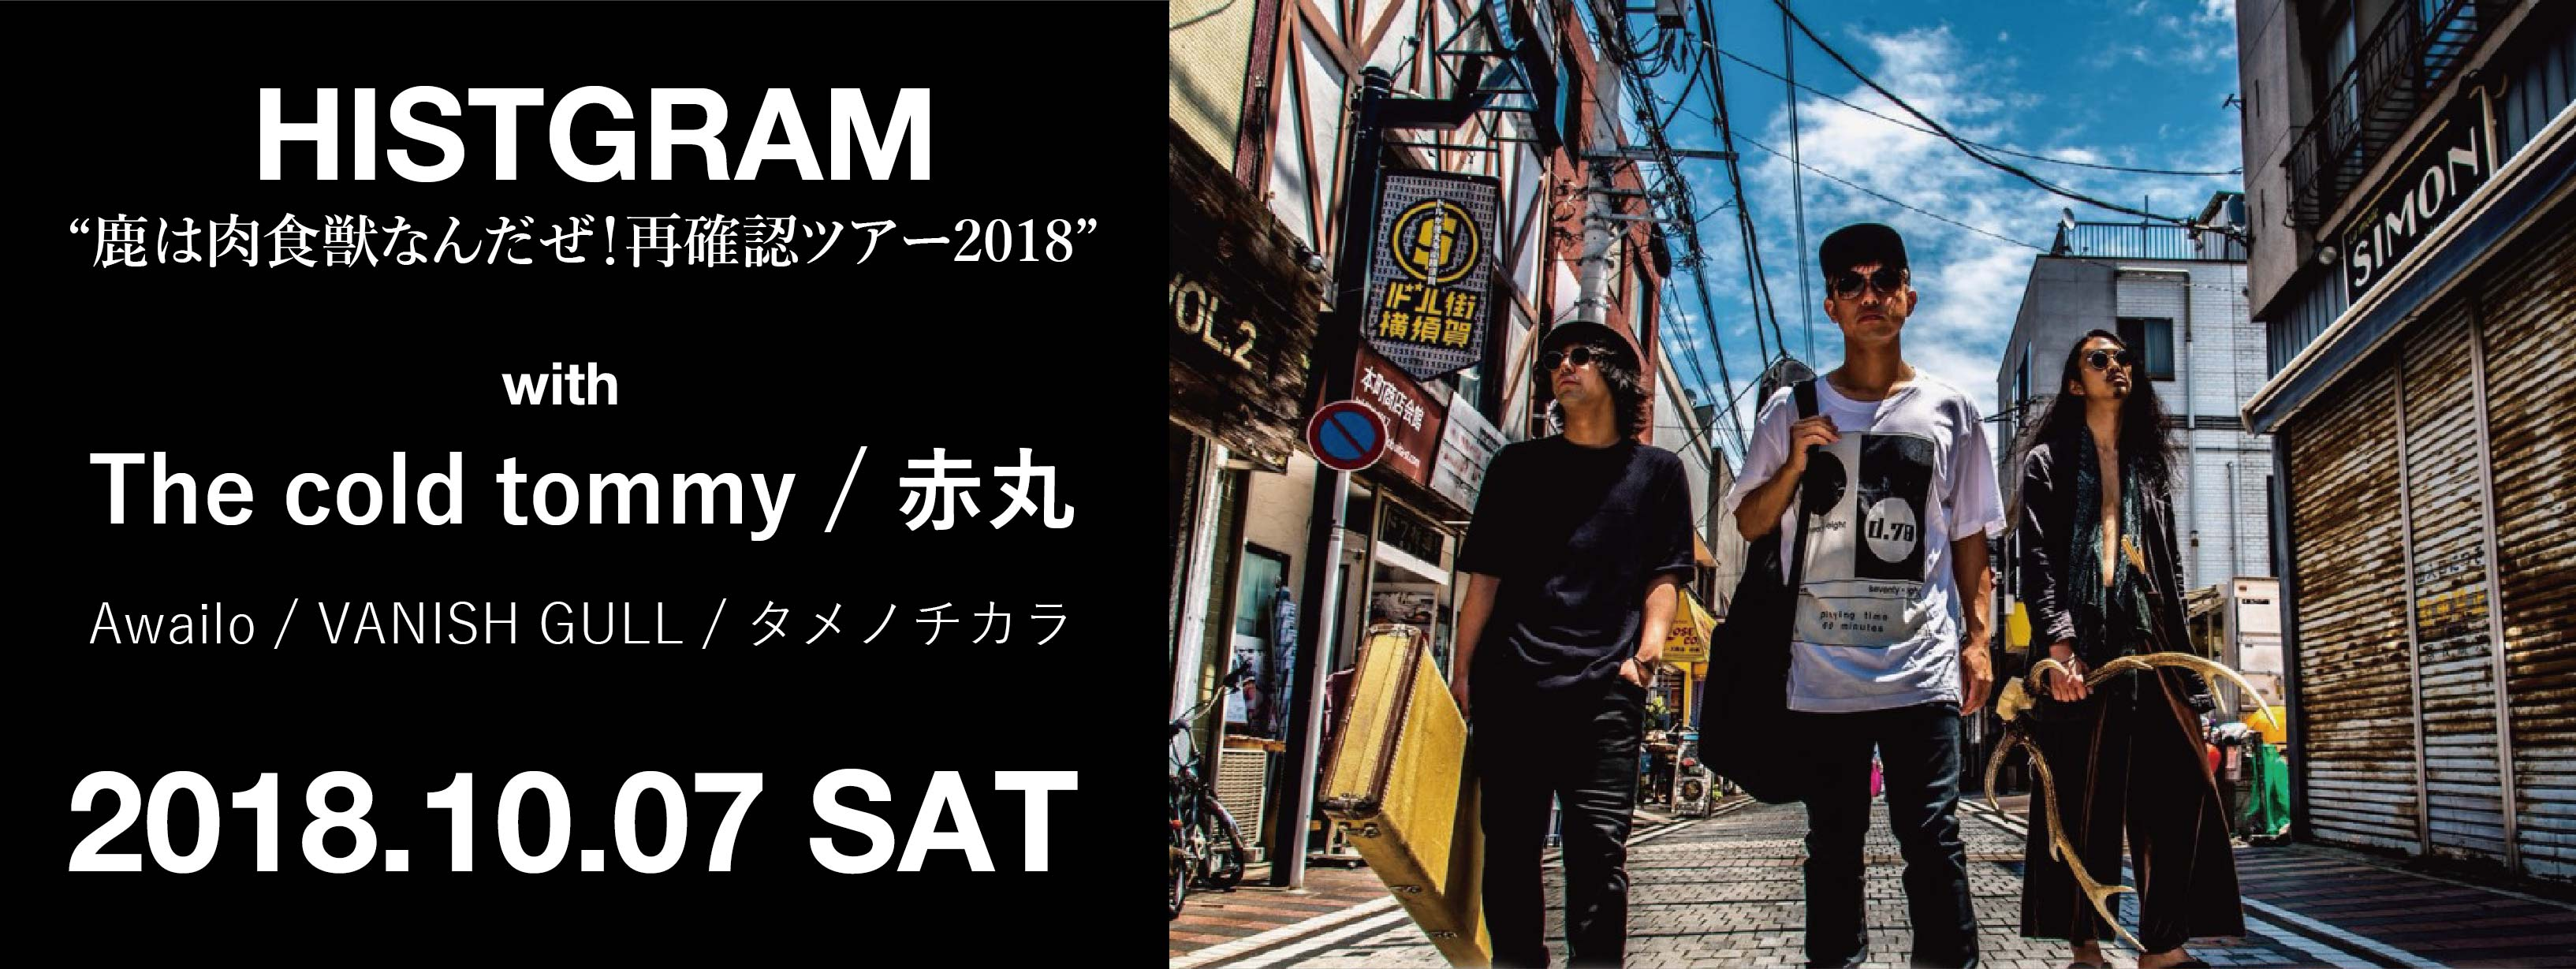 "HISTGRAM ""鹿は肉食獣なんだぜ!再確認ツアー2018″"